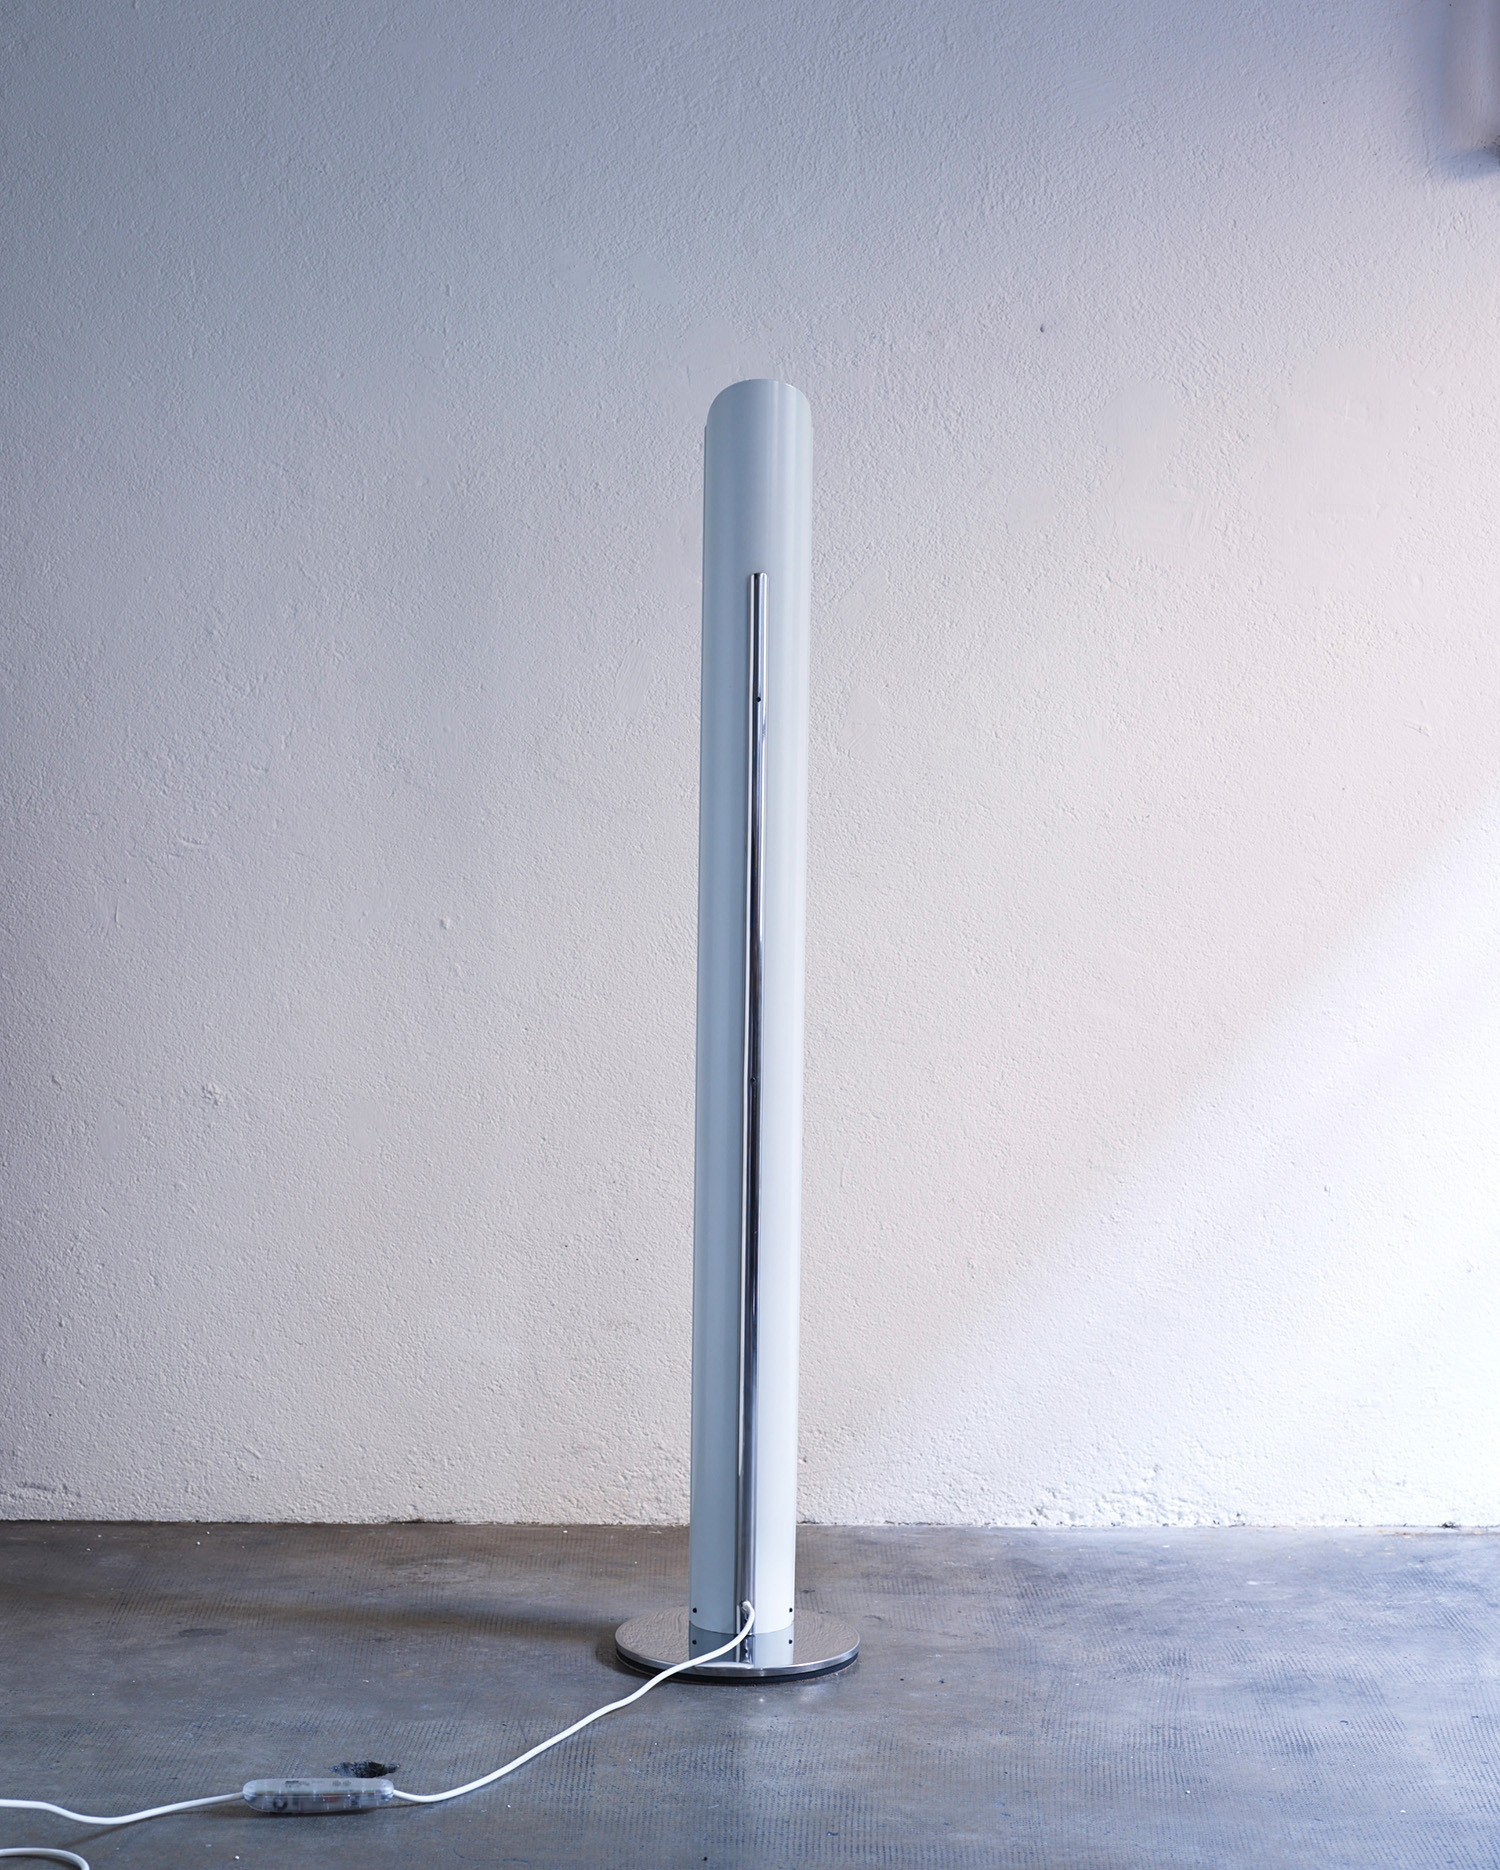 italian-floor-lamp-by-enrico-tronconi-1970-image-04